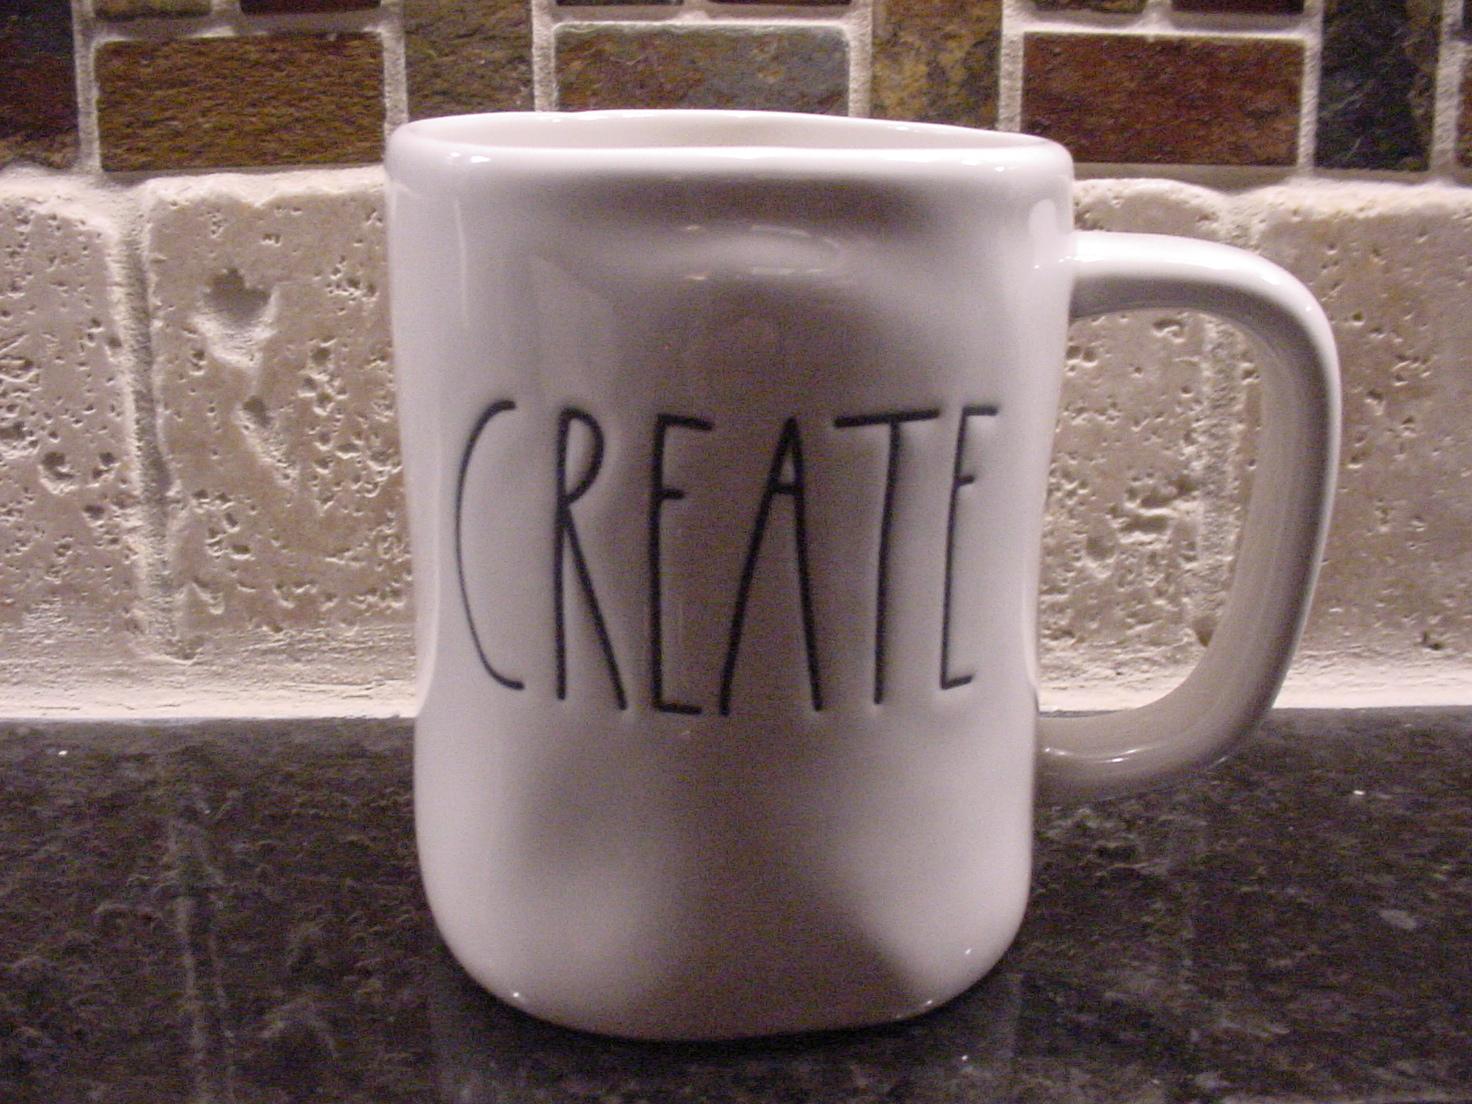 Rae Dunn CREATE Mug, Ivory with Black Lettering